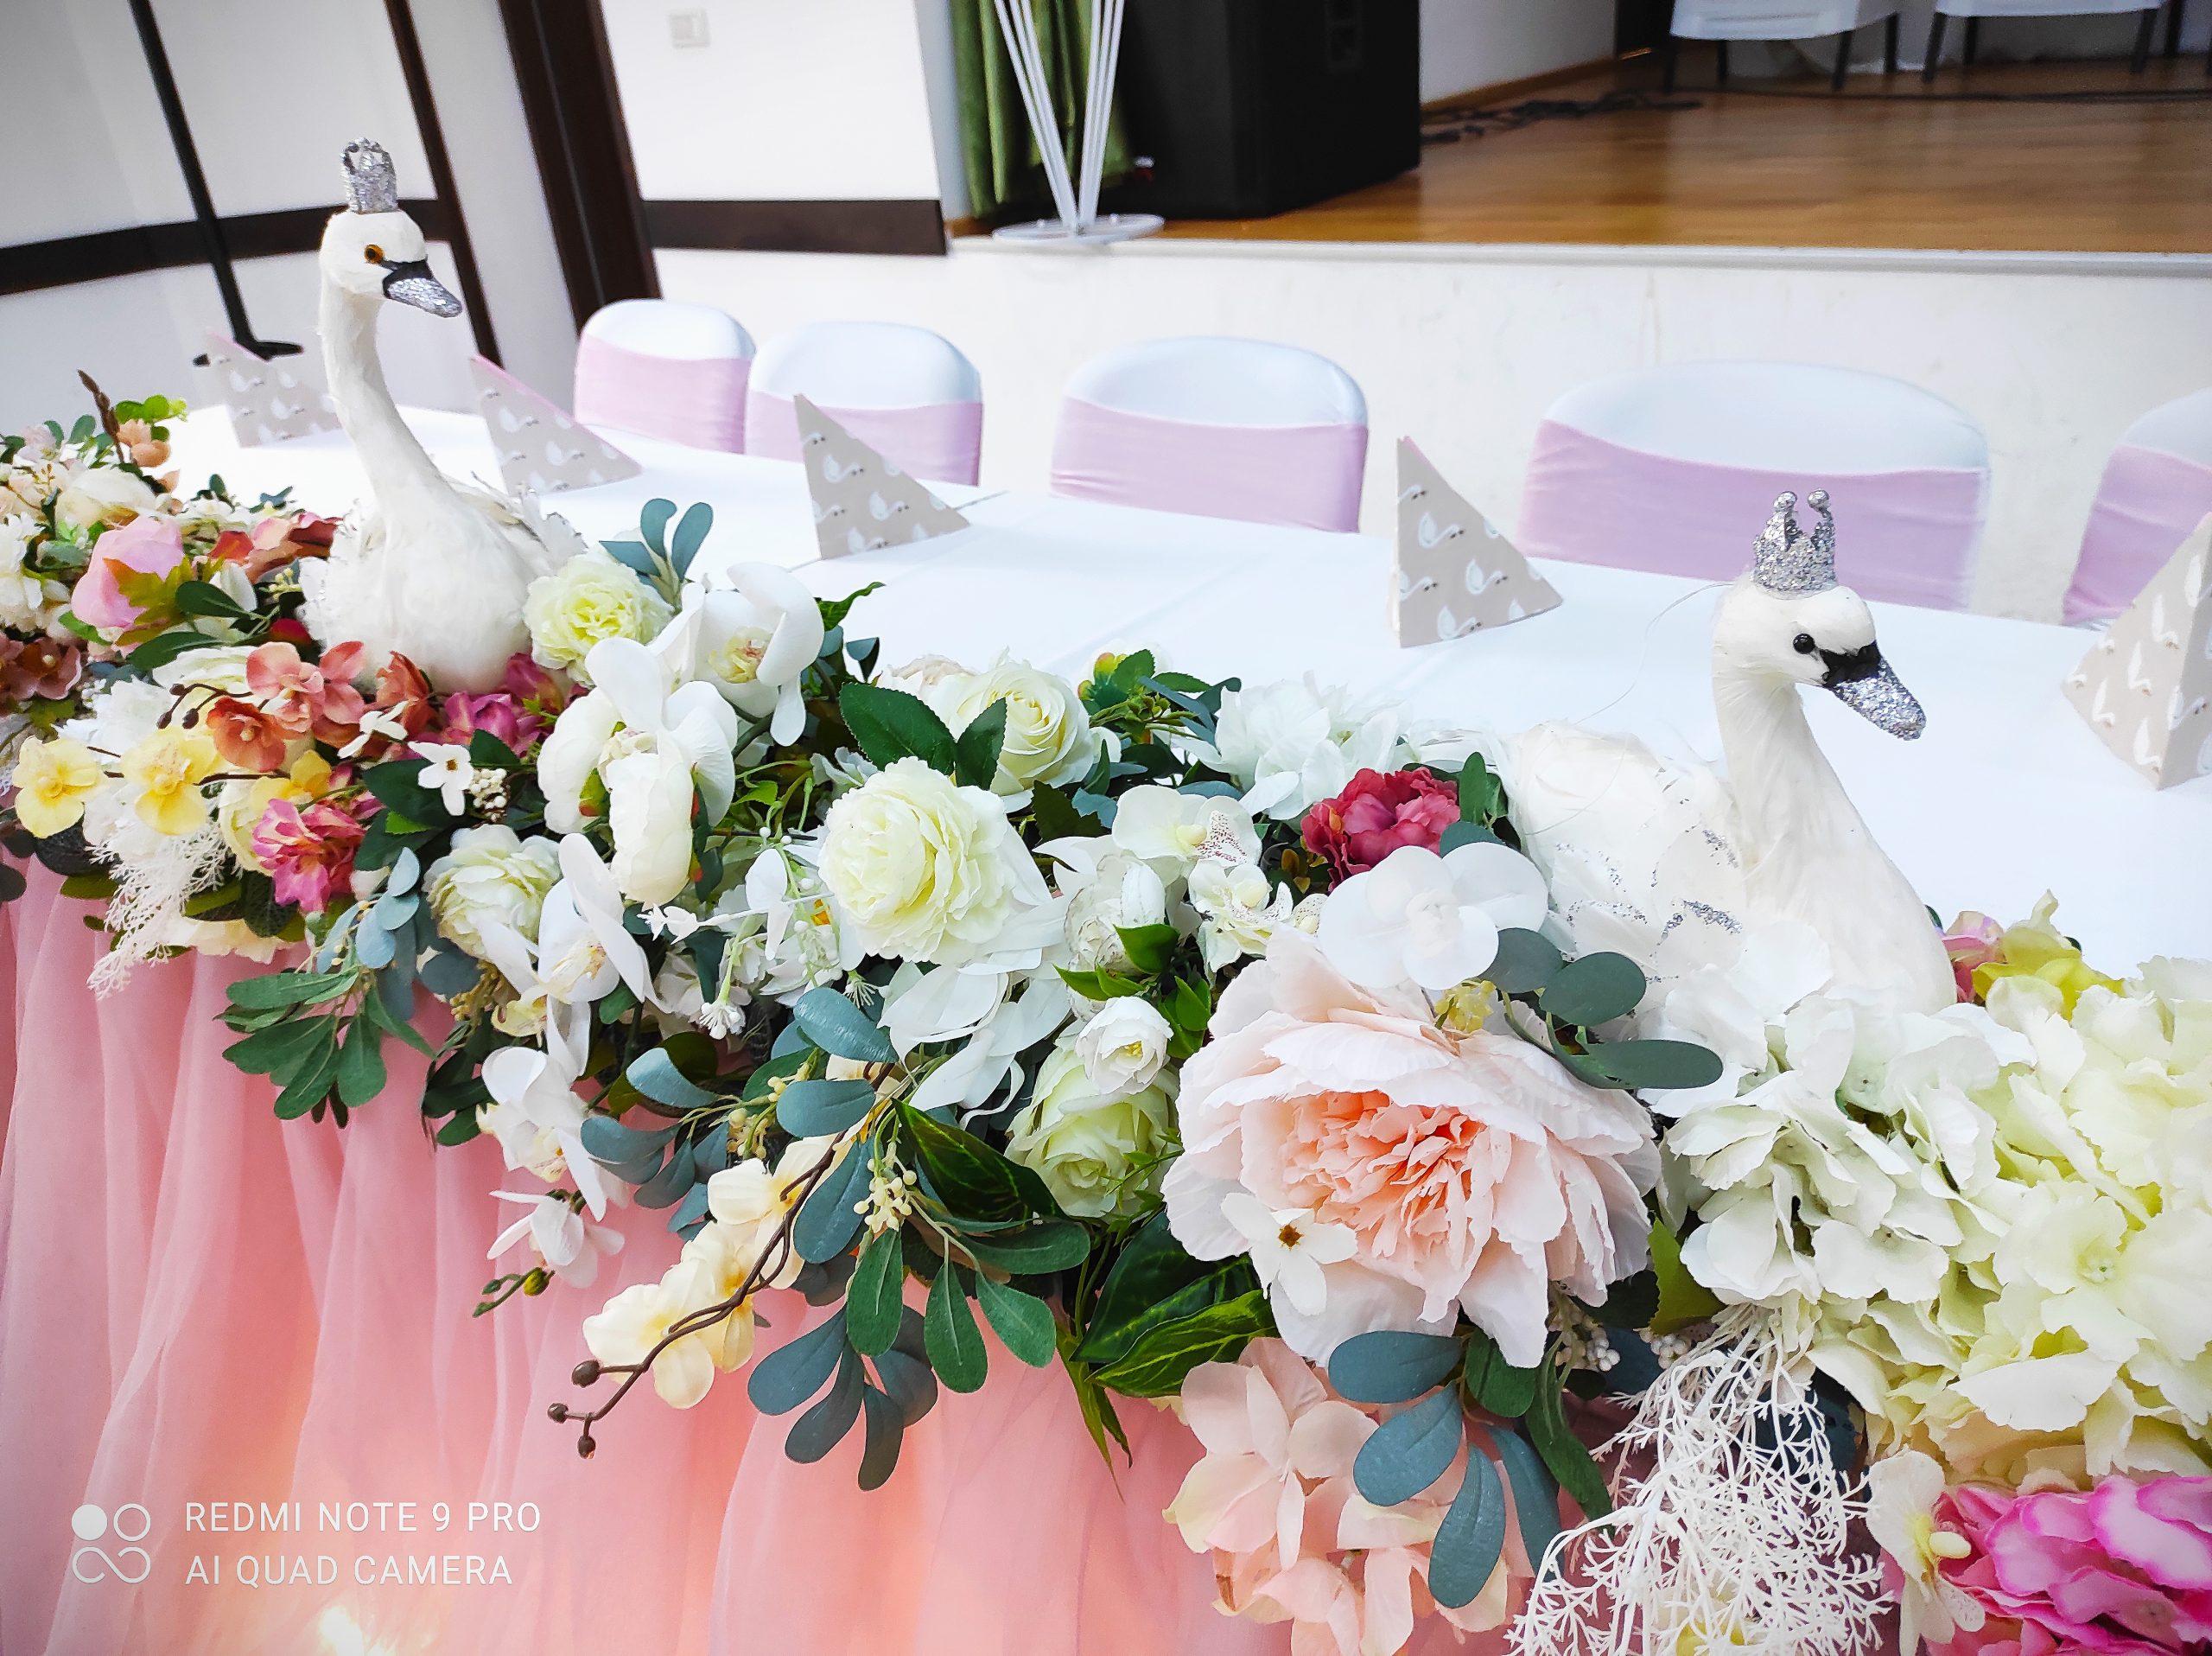 Curs design nunta, botez